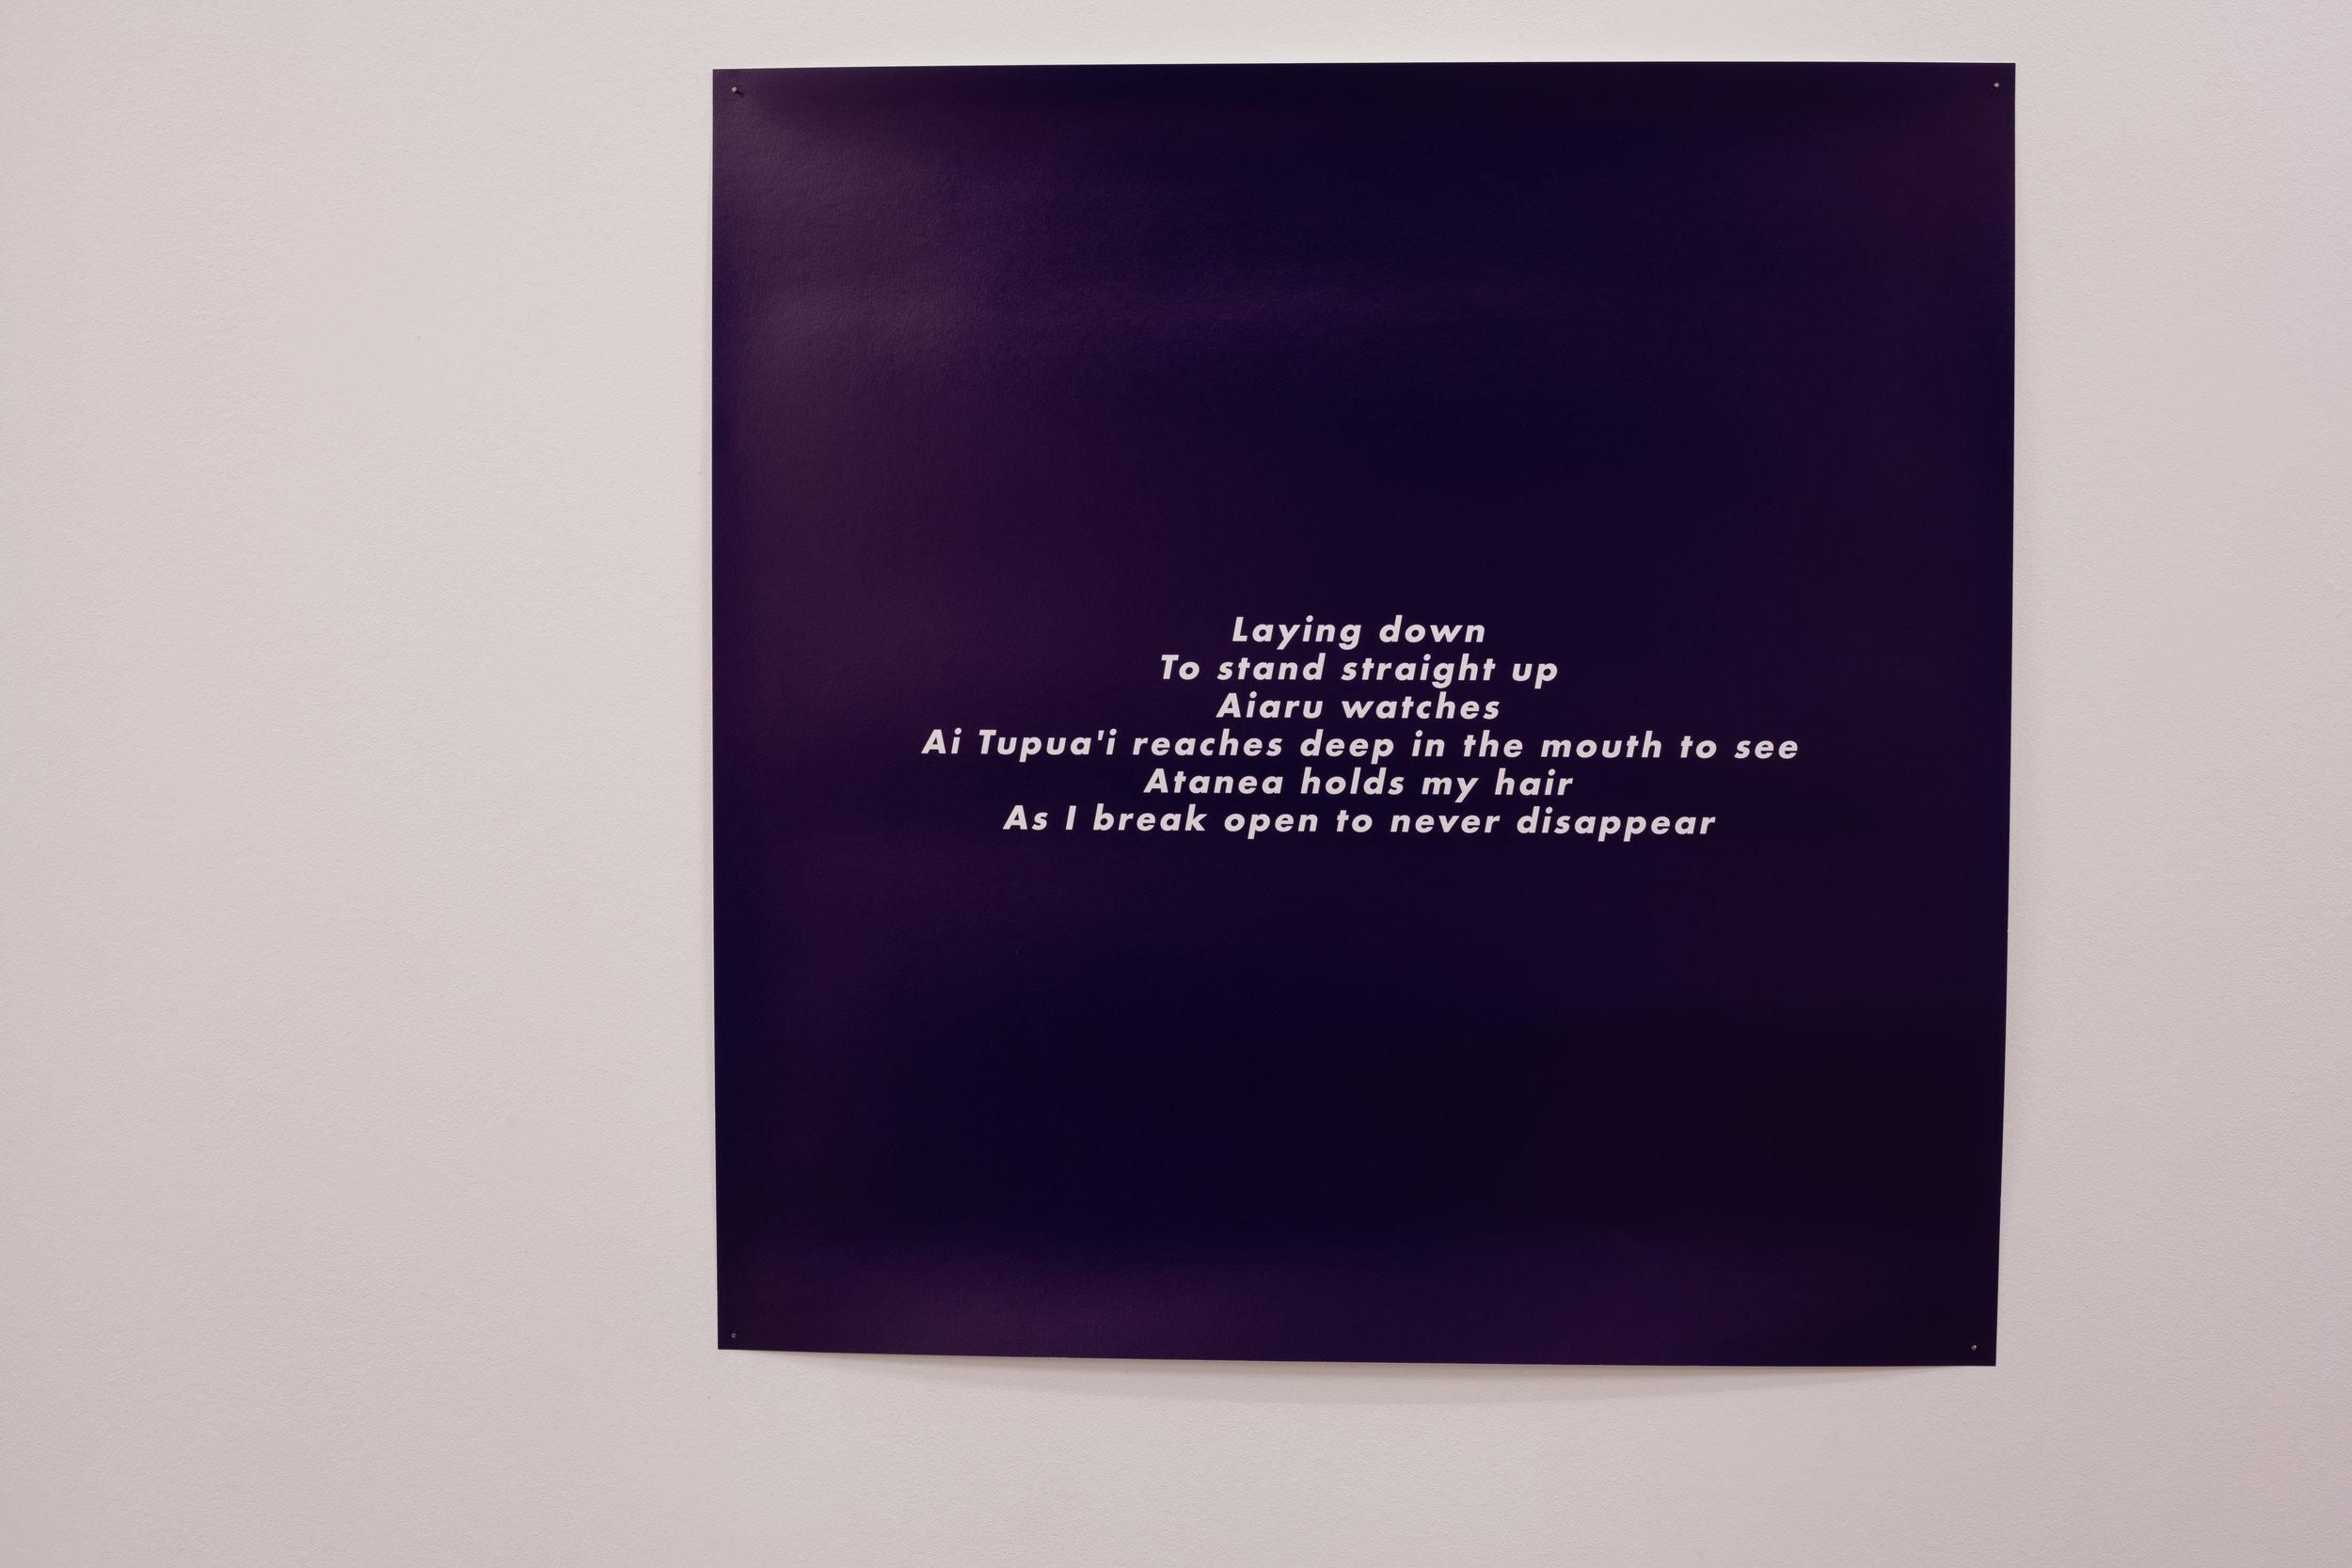 Ama ama tuai i te ahu tapu,  Giclee print on Hahnemühle Pearl, 814mm x 814mm, 2019 Image: ©2018 Crystal Te Moananui Squares